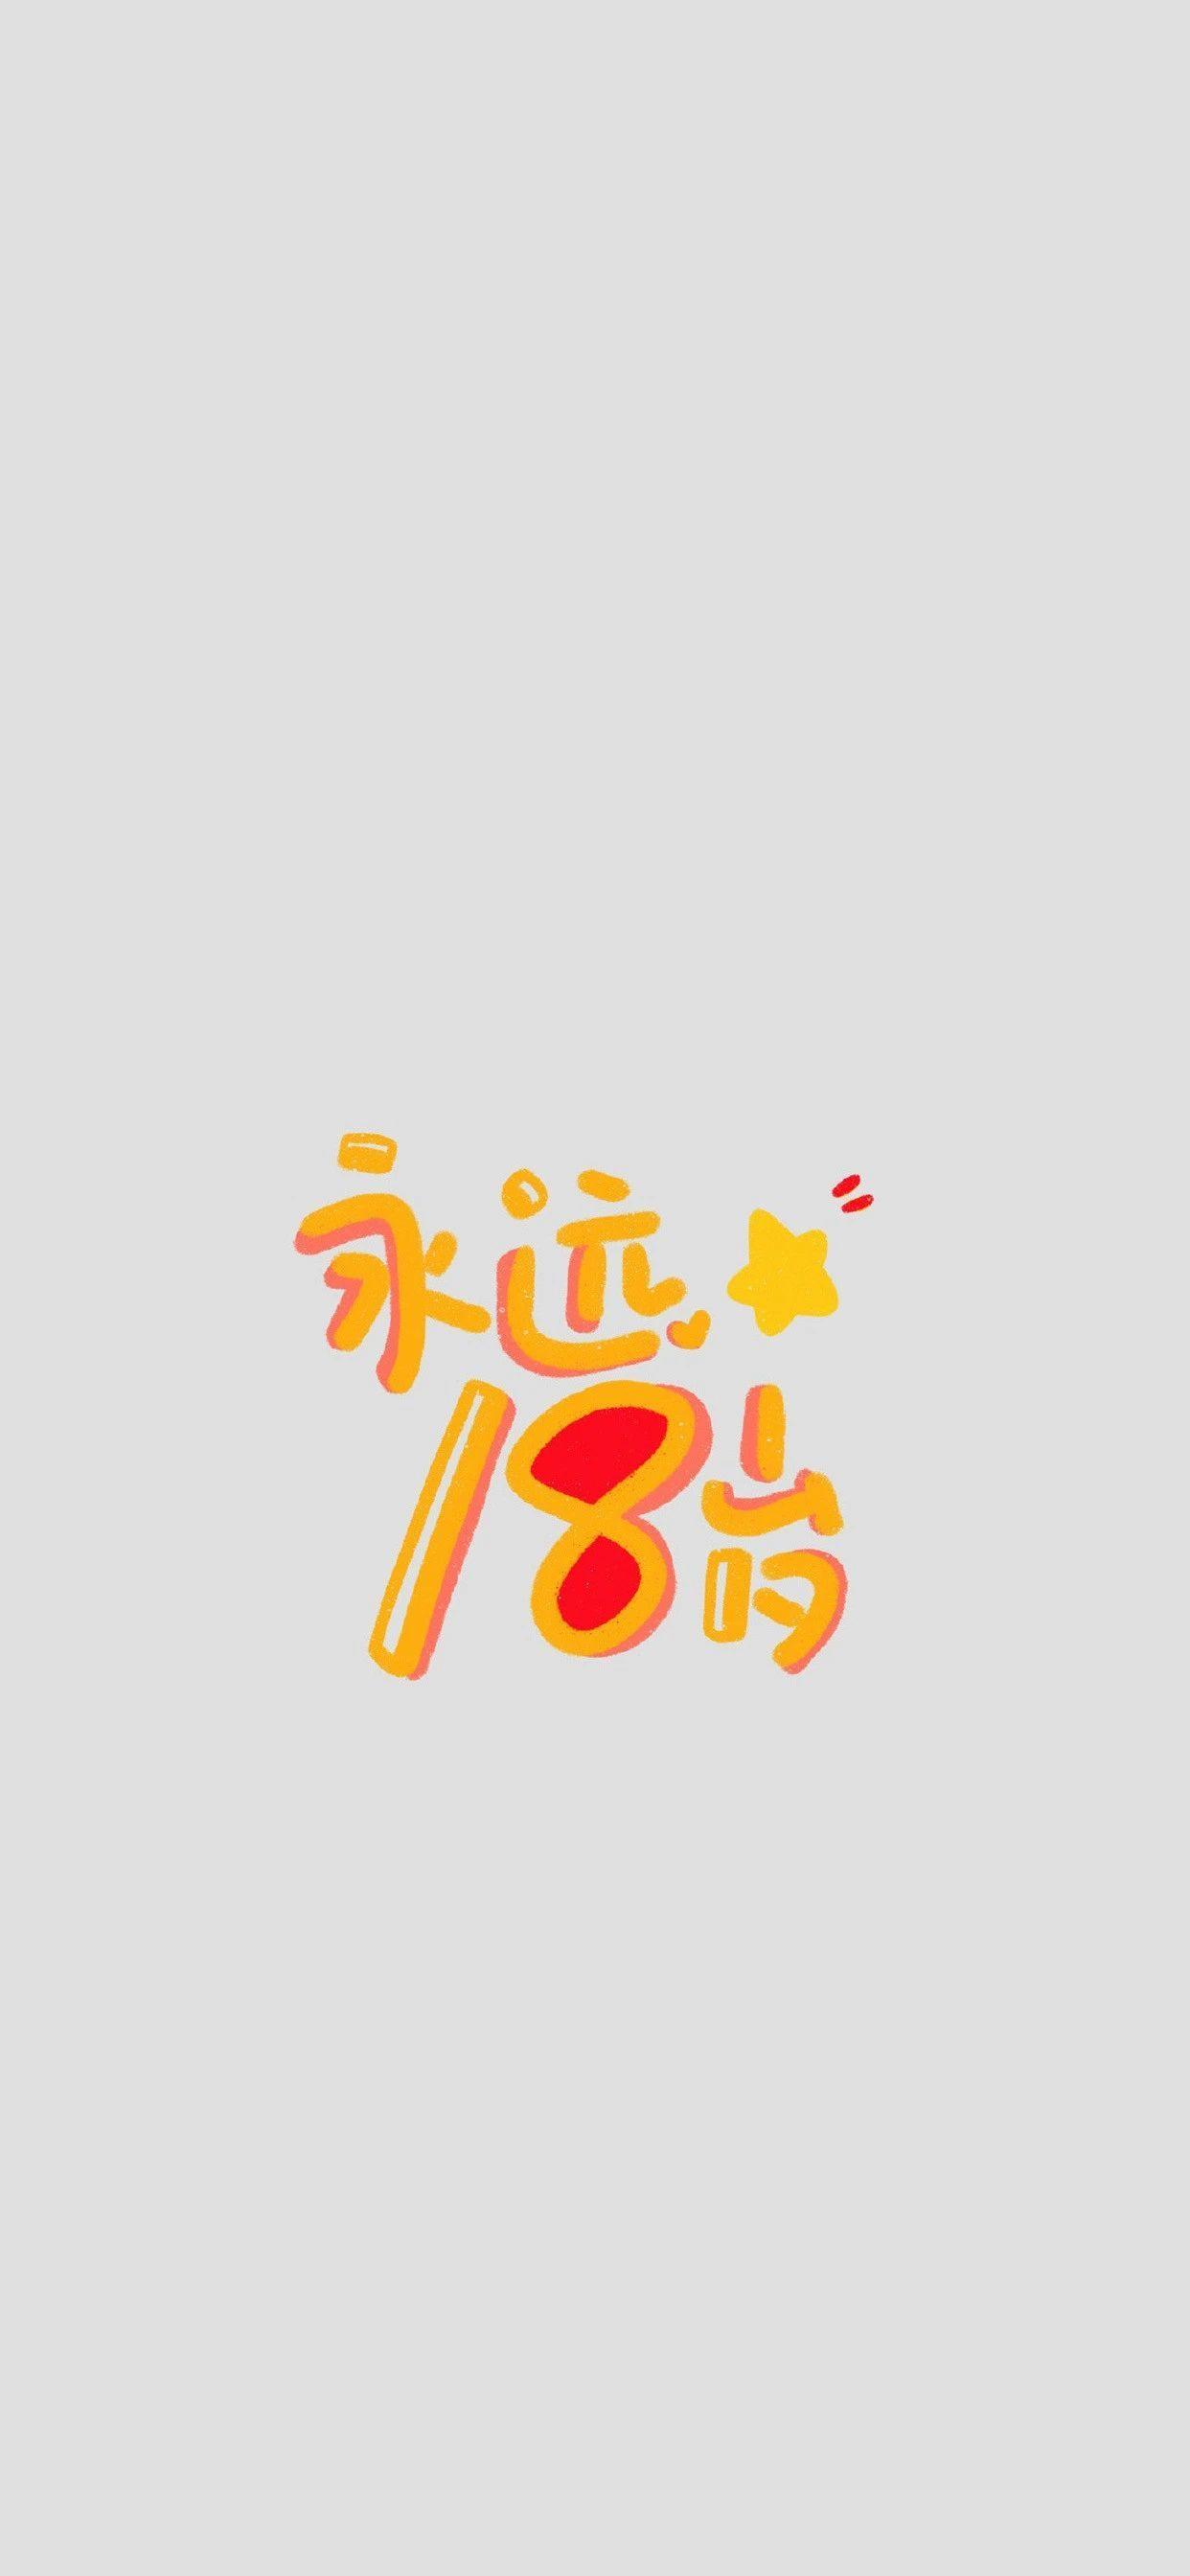 5e5d477d13365 - 精选壁纸:正能量 小清新 文字!